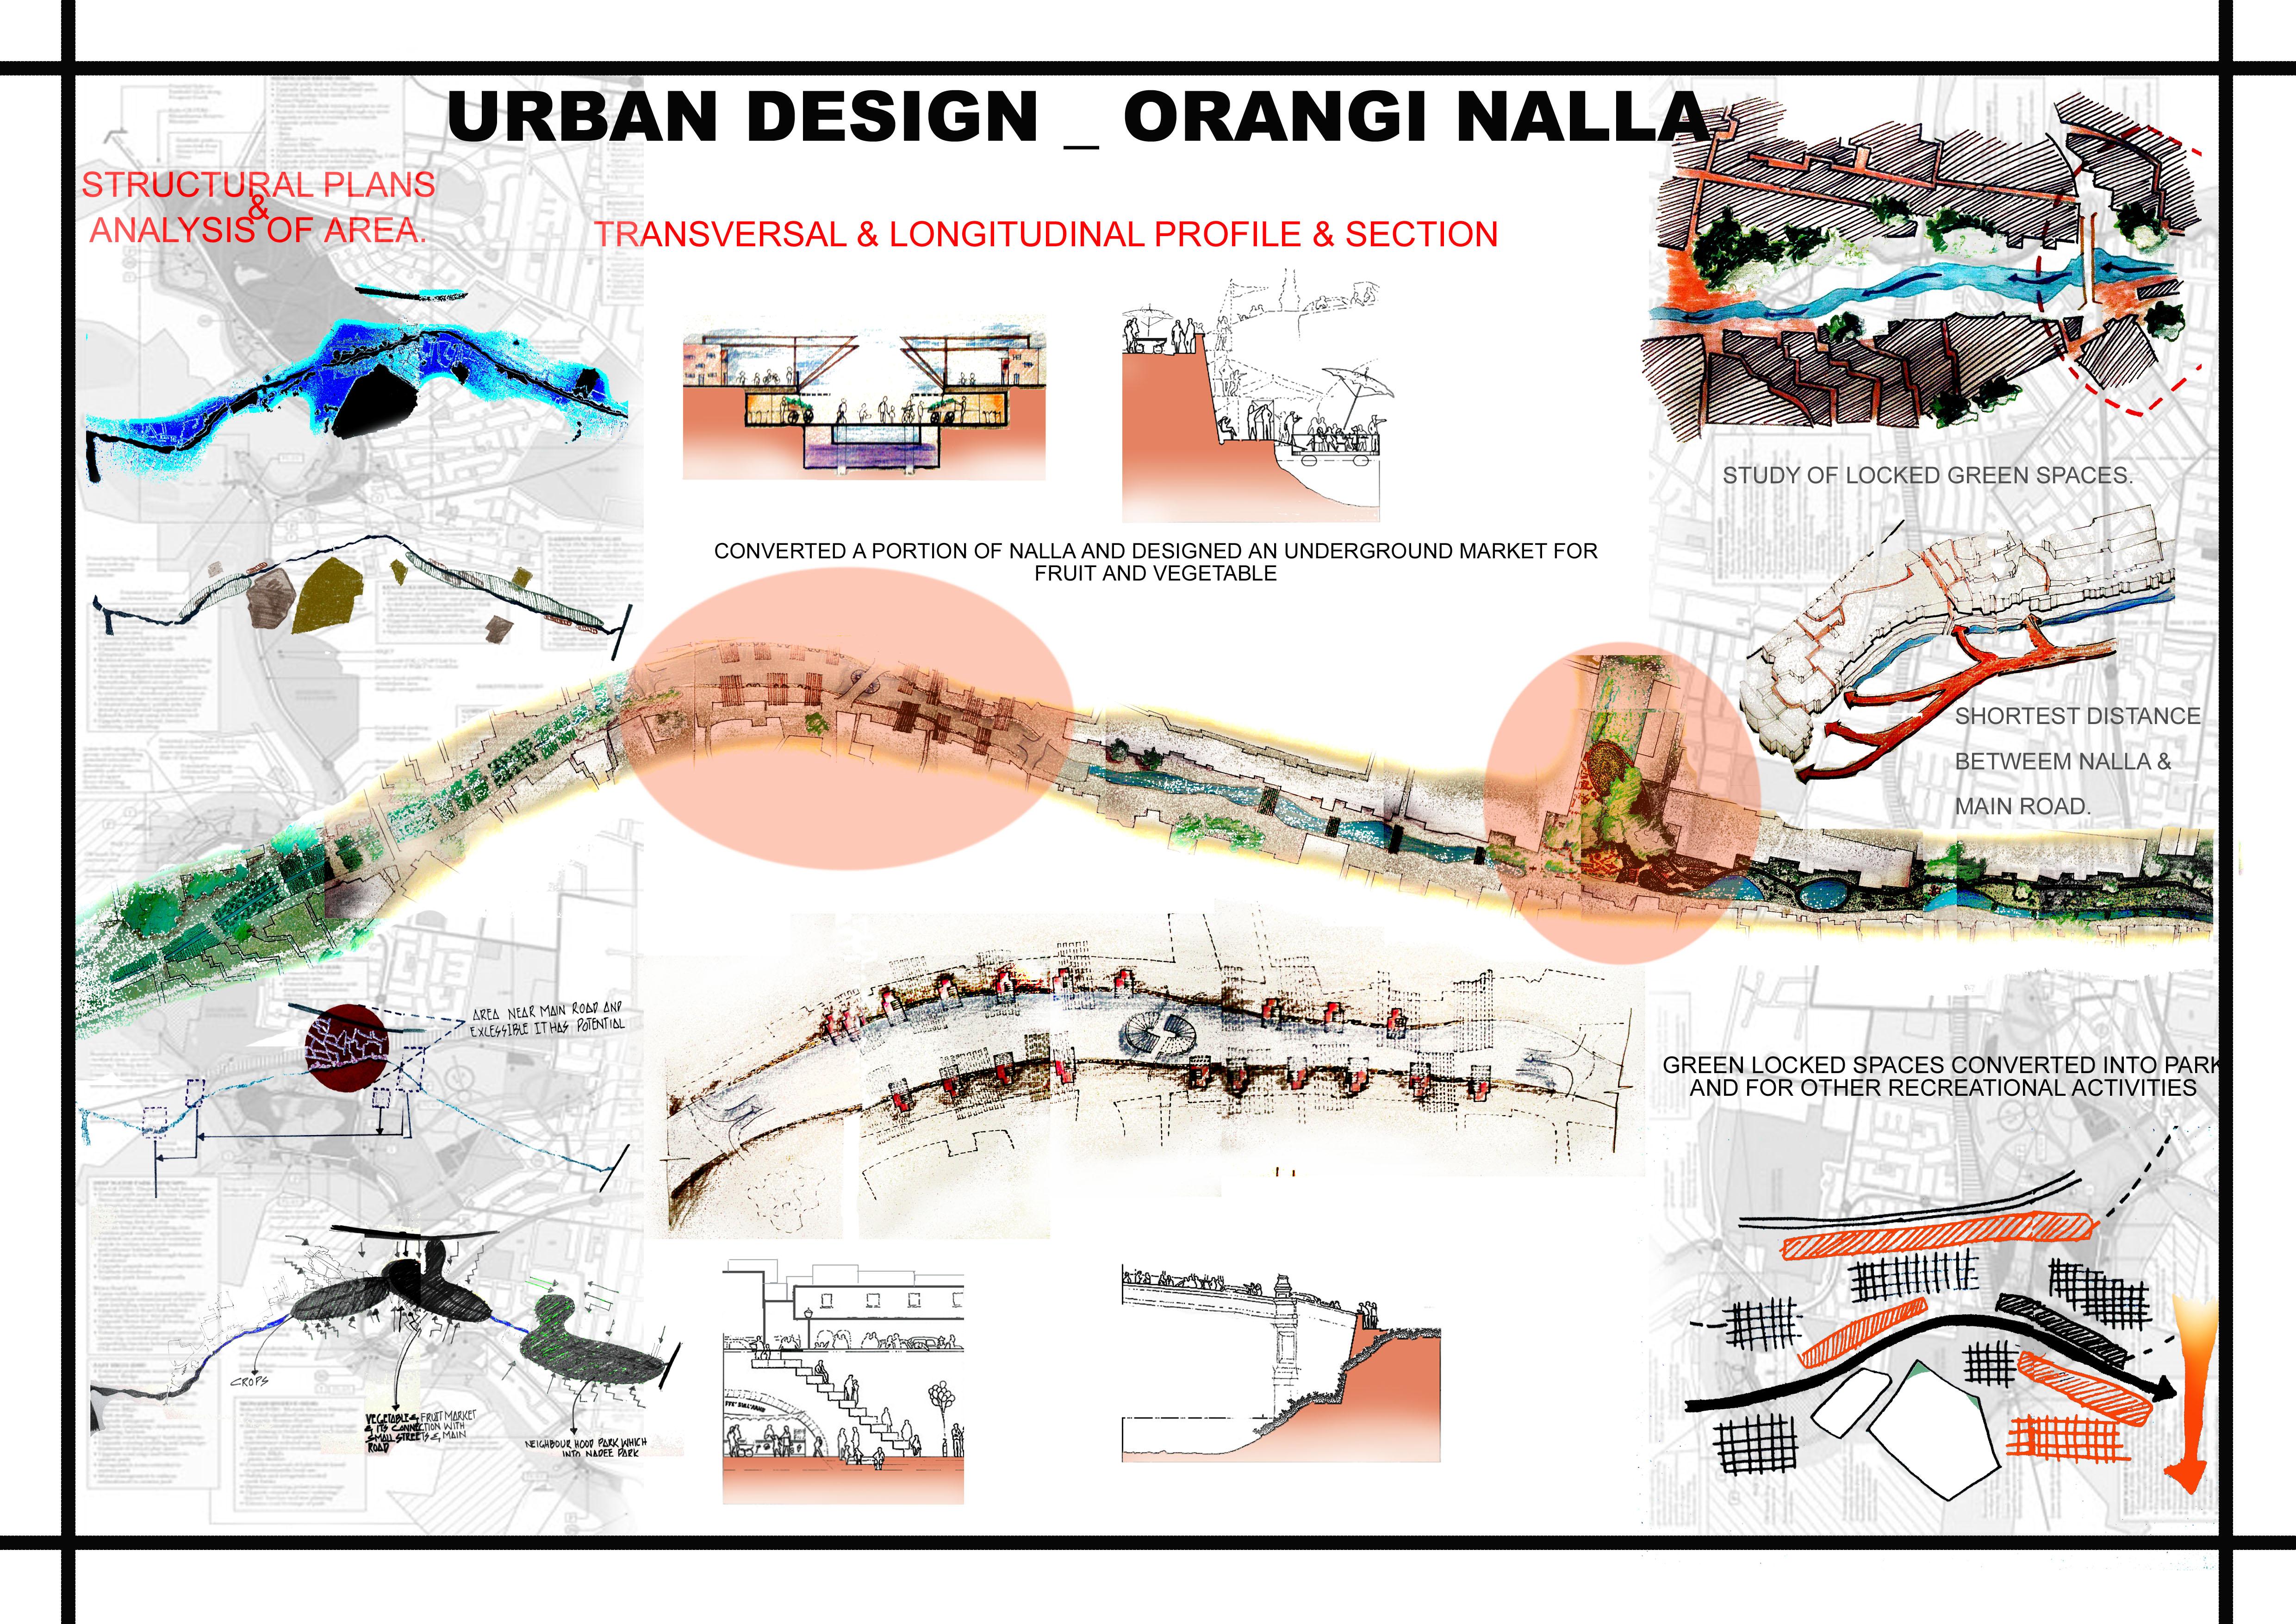 Urban Design Character Analysis : Urban design orangi nalla by anilla asrar at coroflot